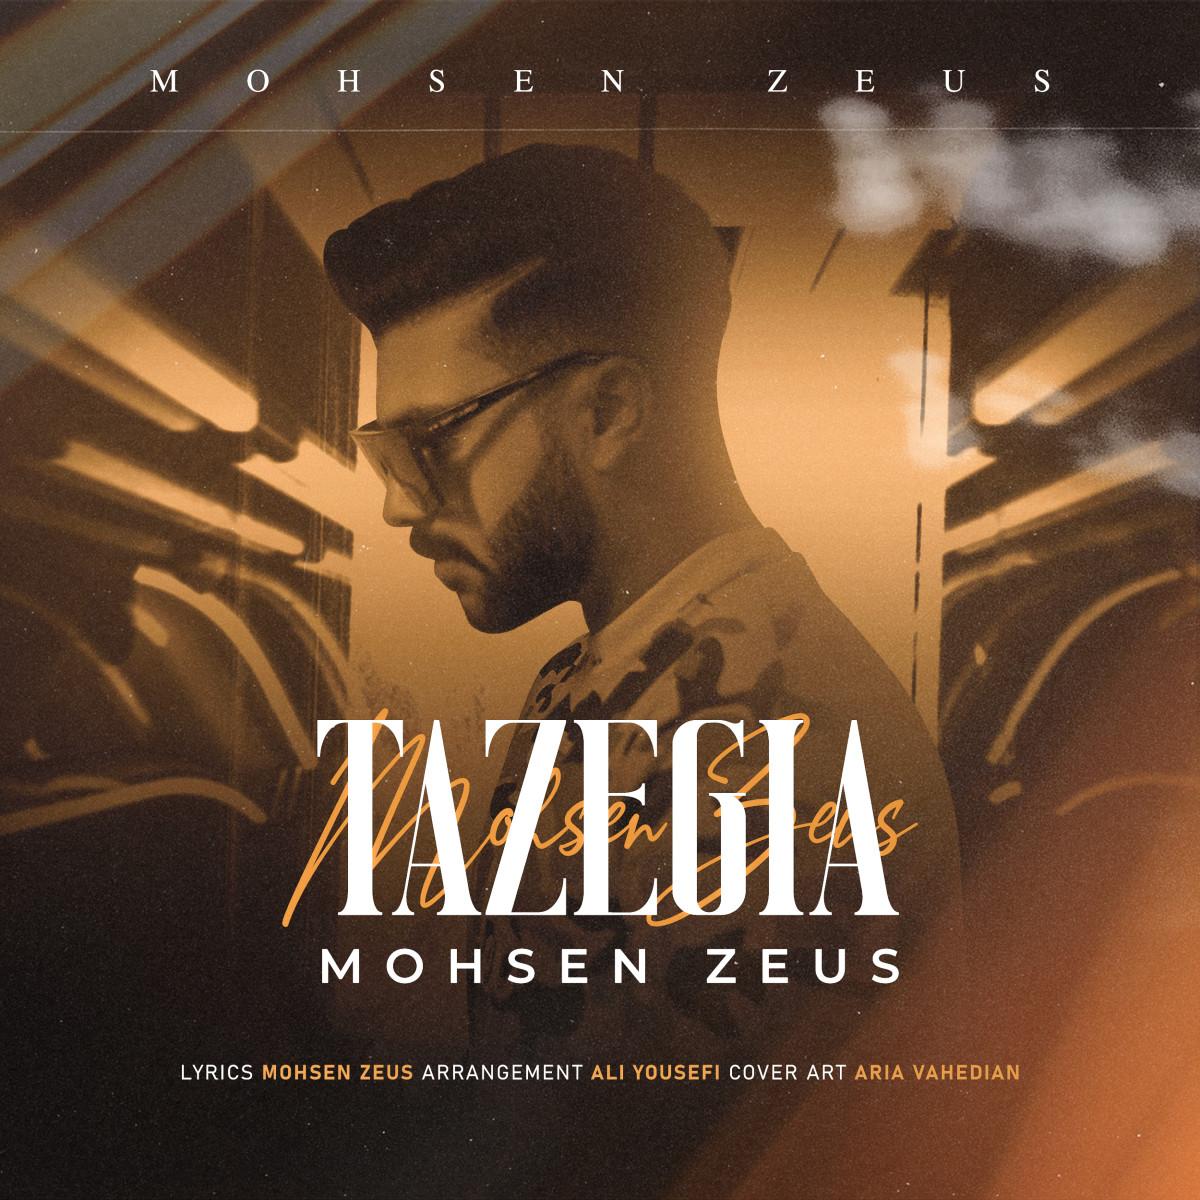 Mohsen Zeus - Tazegiya Video